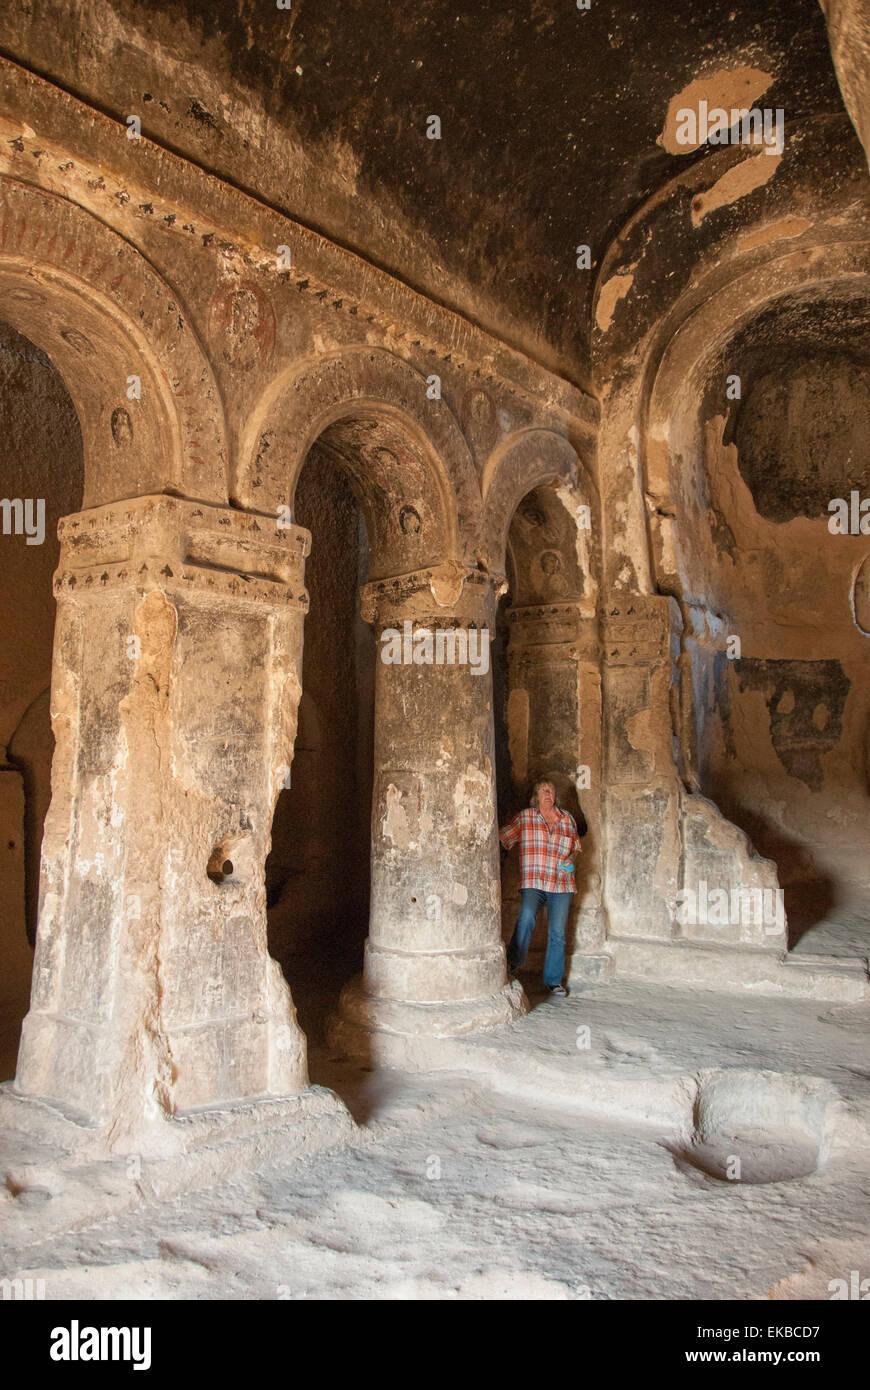 Selime, Ihlara, western Cappadocia, Anatolia, Turkey, Asia Minor, Eurasia - Stock Image